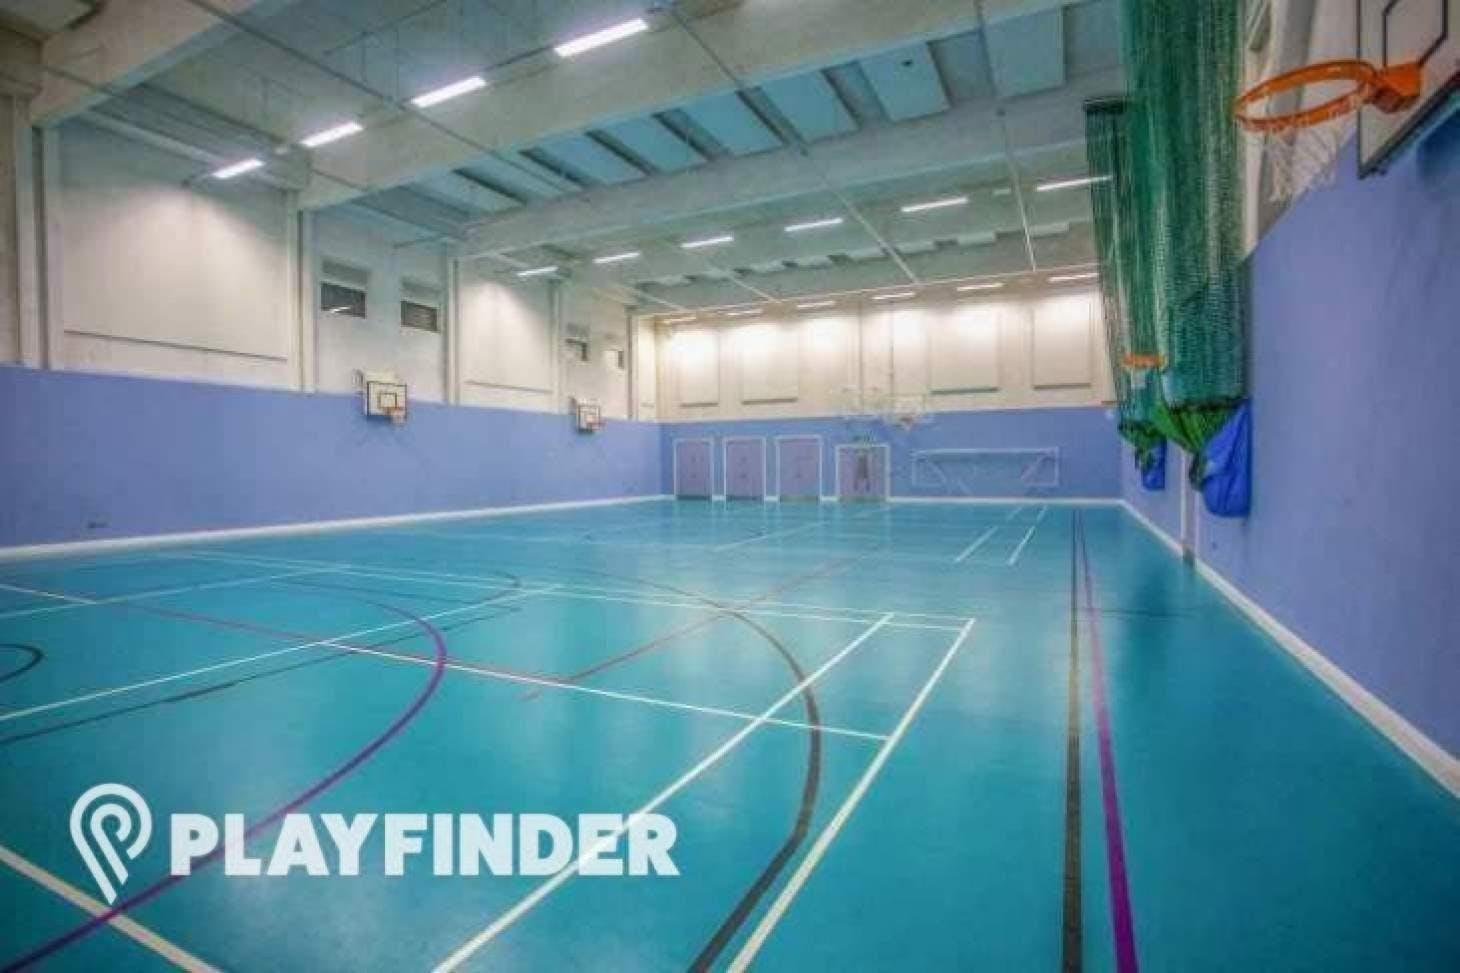 Mossbourne Victoria Park Academy Nets | Sports hall cricket facilities